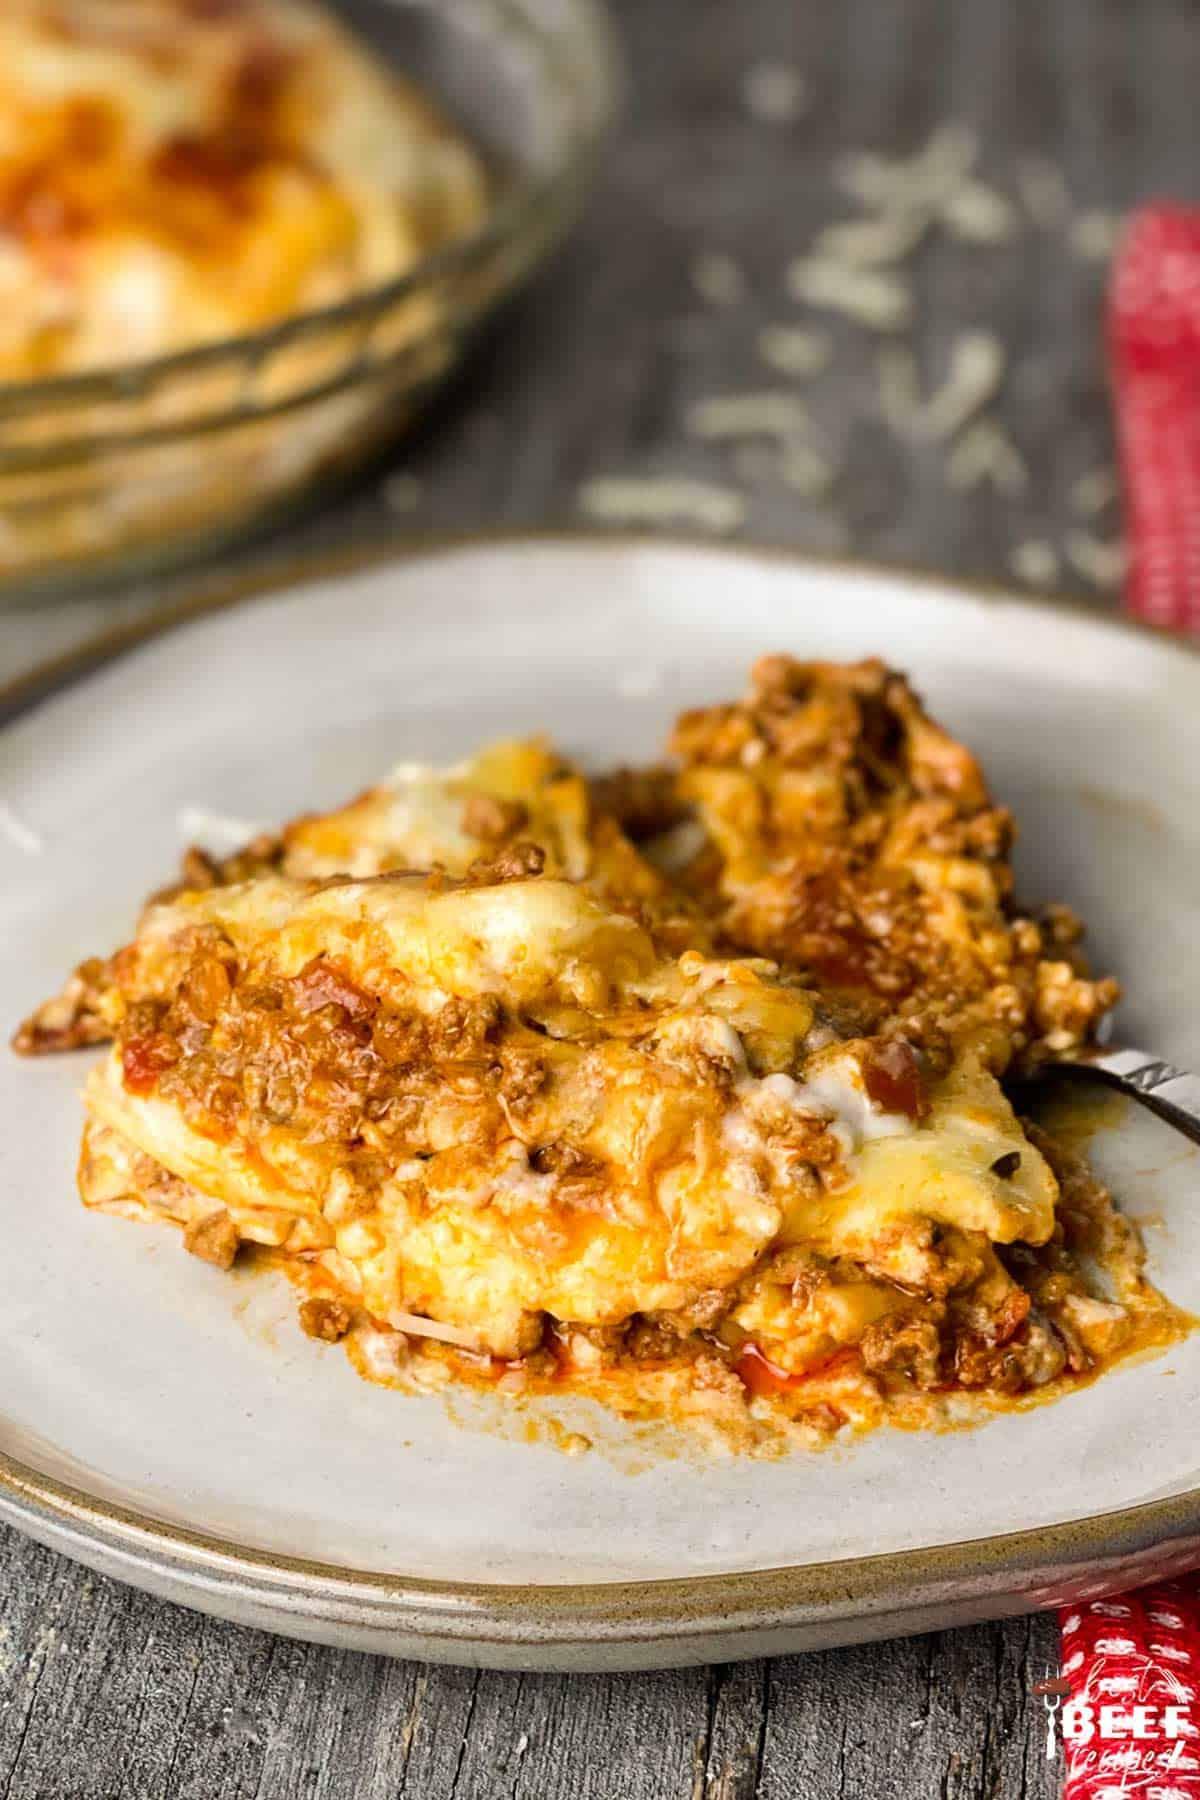 Instant pot lasagna sliced on a plate